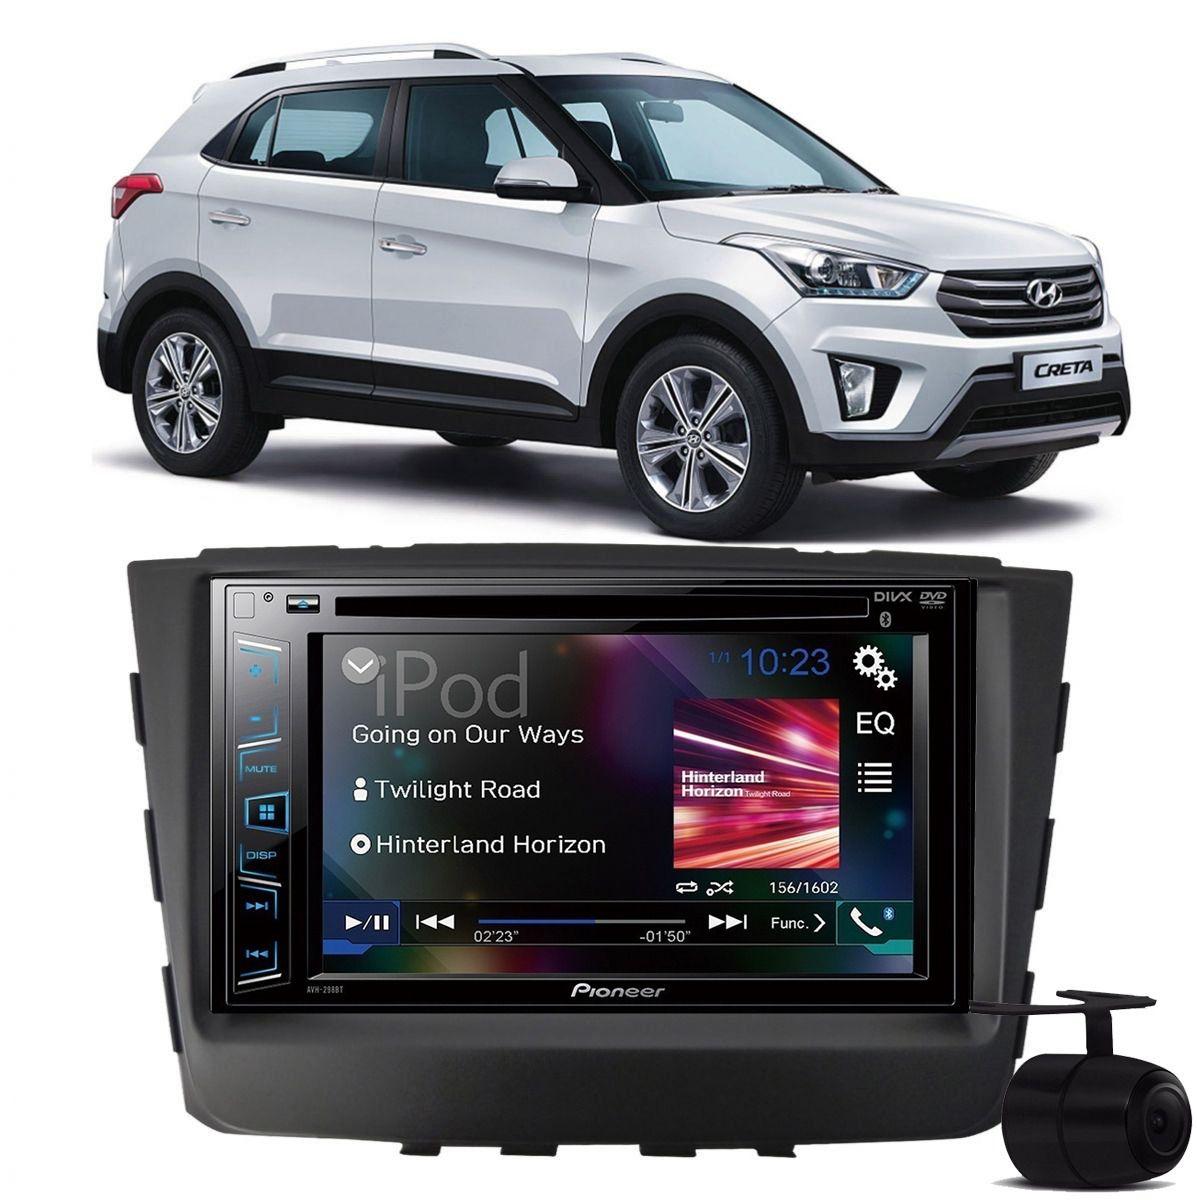 Central Multimidia Nissan Hyundai Creta 2017 2019 - Kit Combo DVD Pioneer AVH-A208BT + Moldura de Painel 2 Din + Câmera de Ré Versão PCD